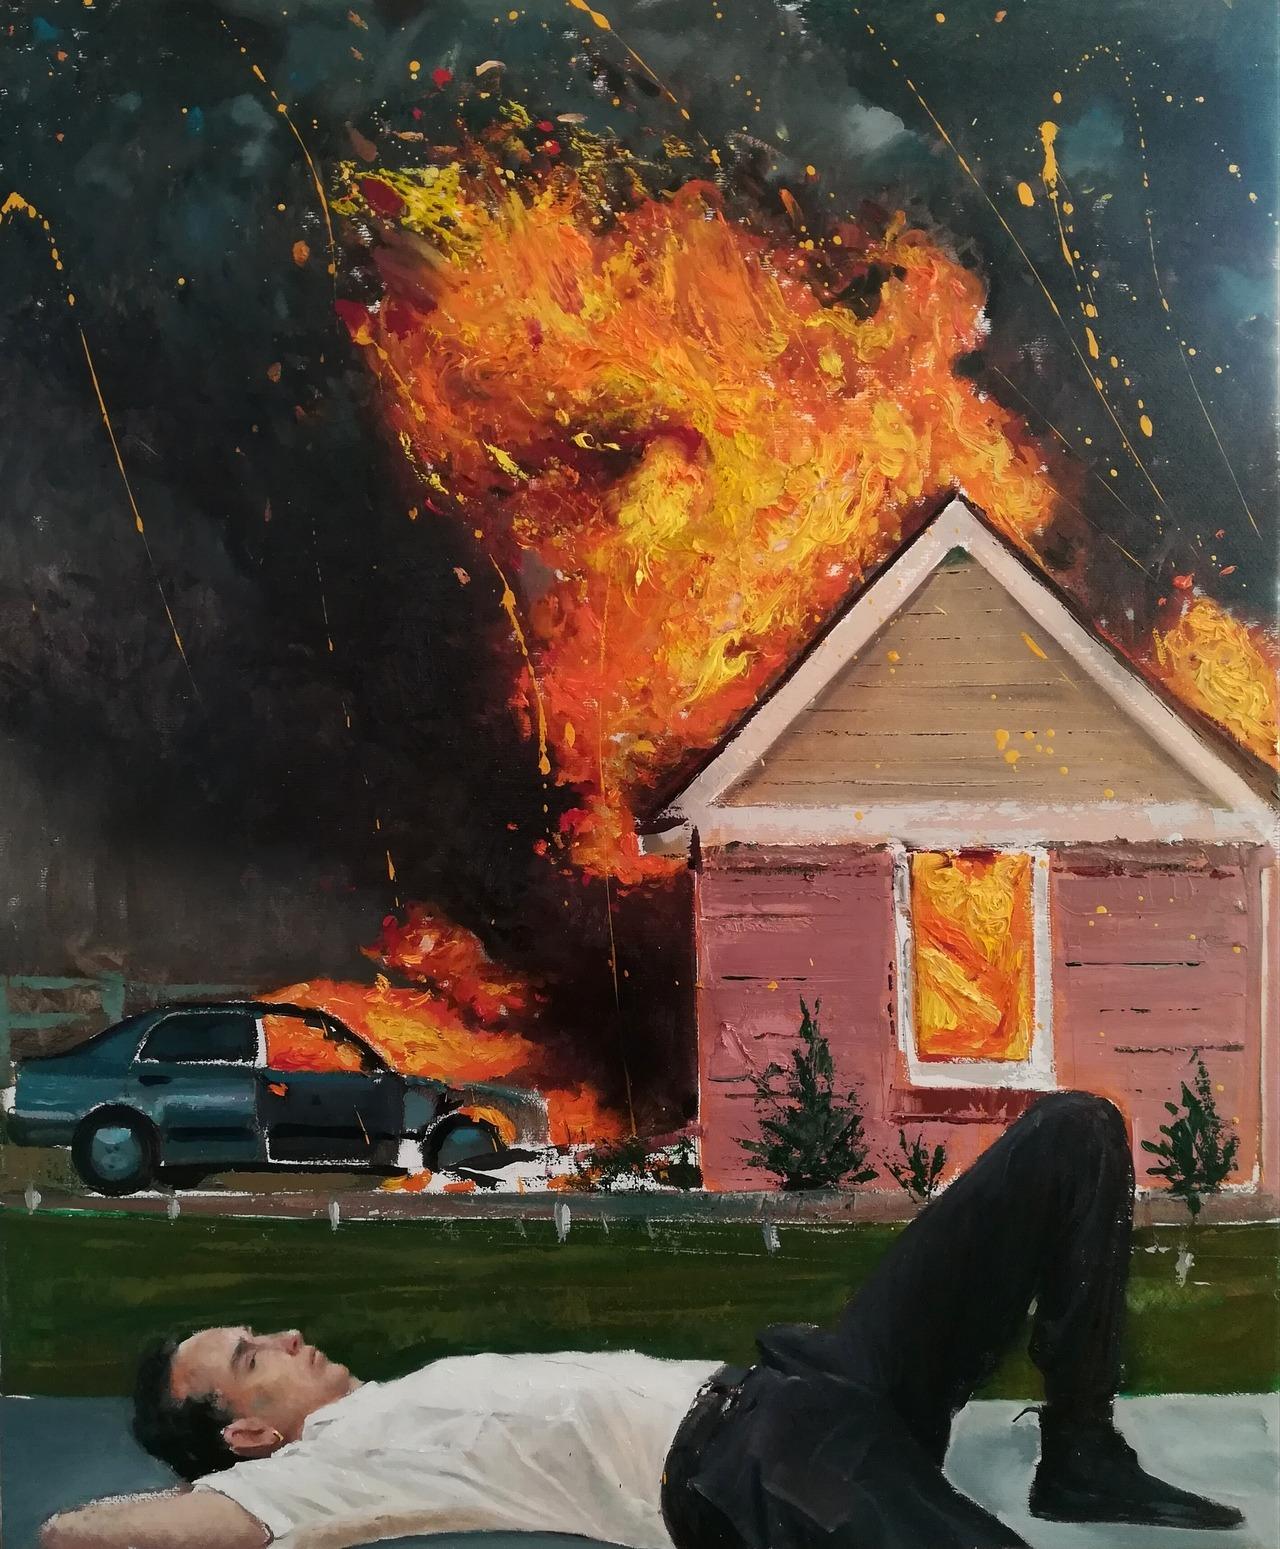 ''The fire in me II''